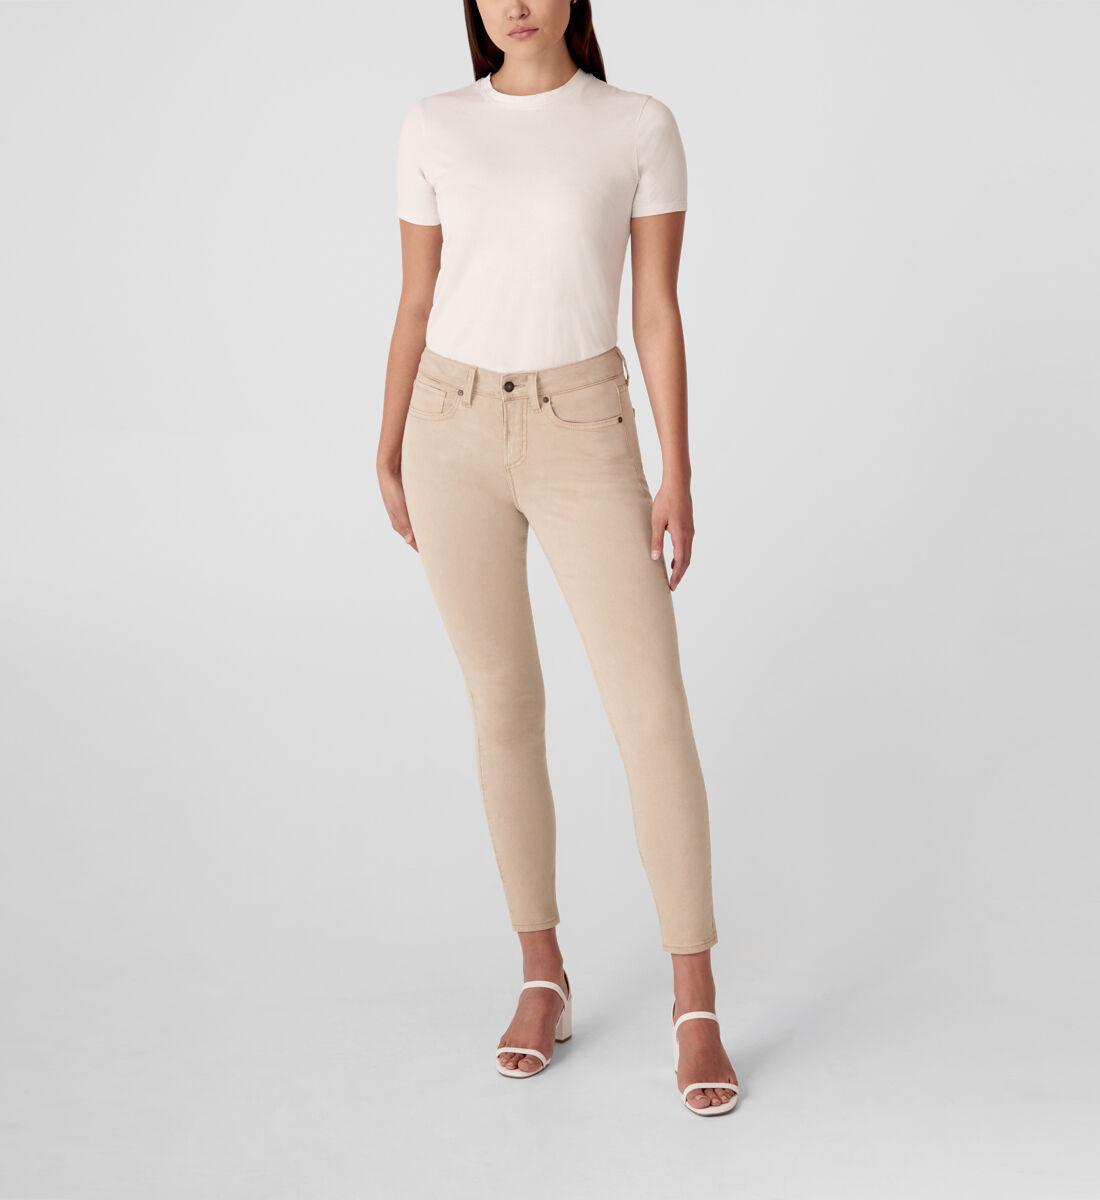 Suki Mid Rise Skinny Jeans,Tan Front